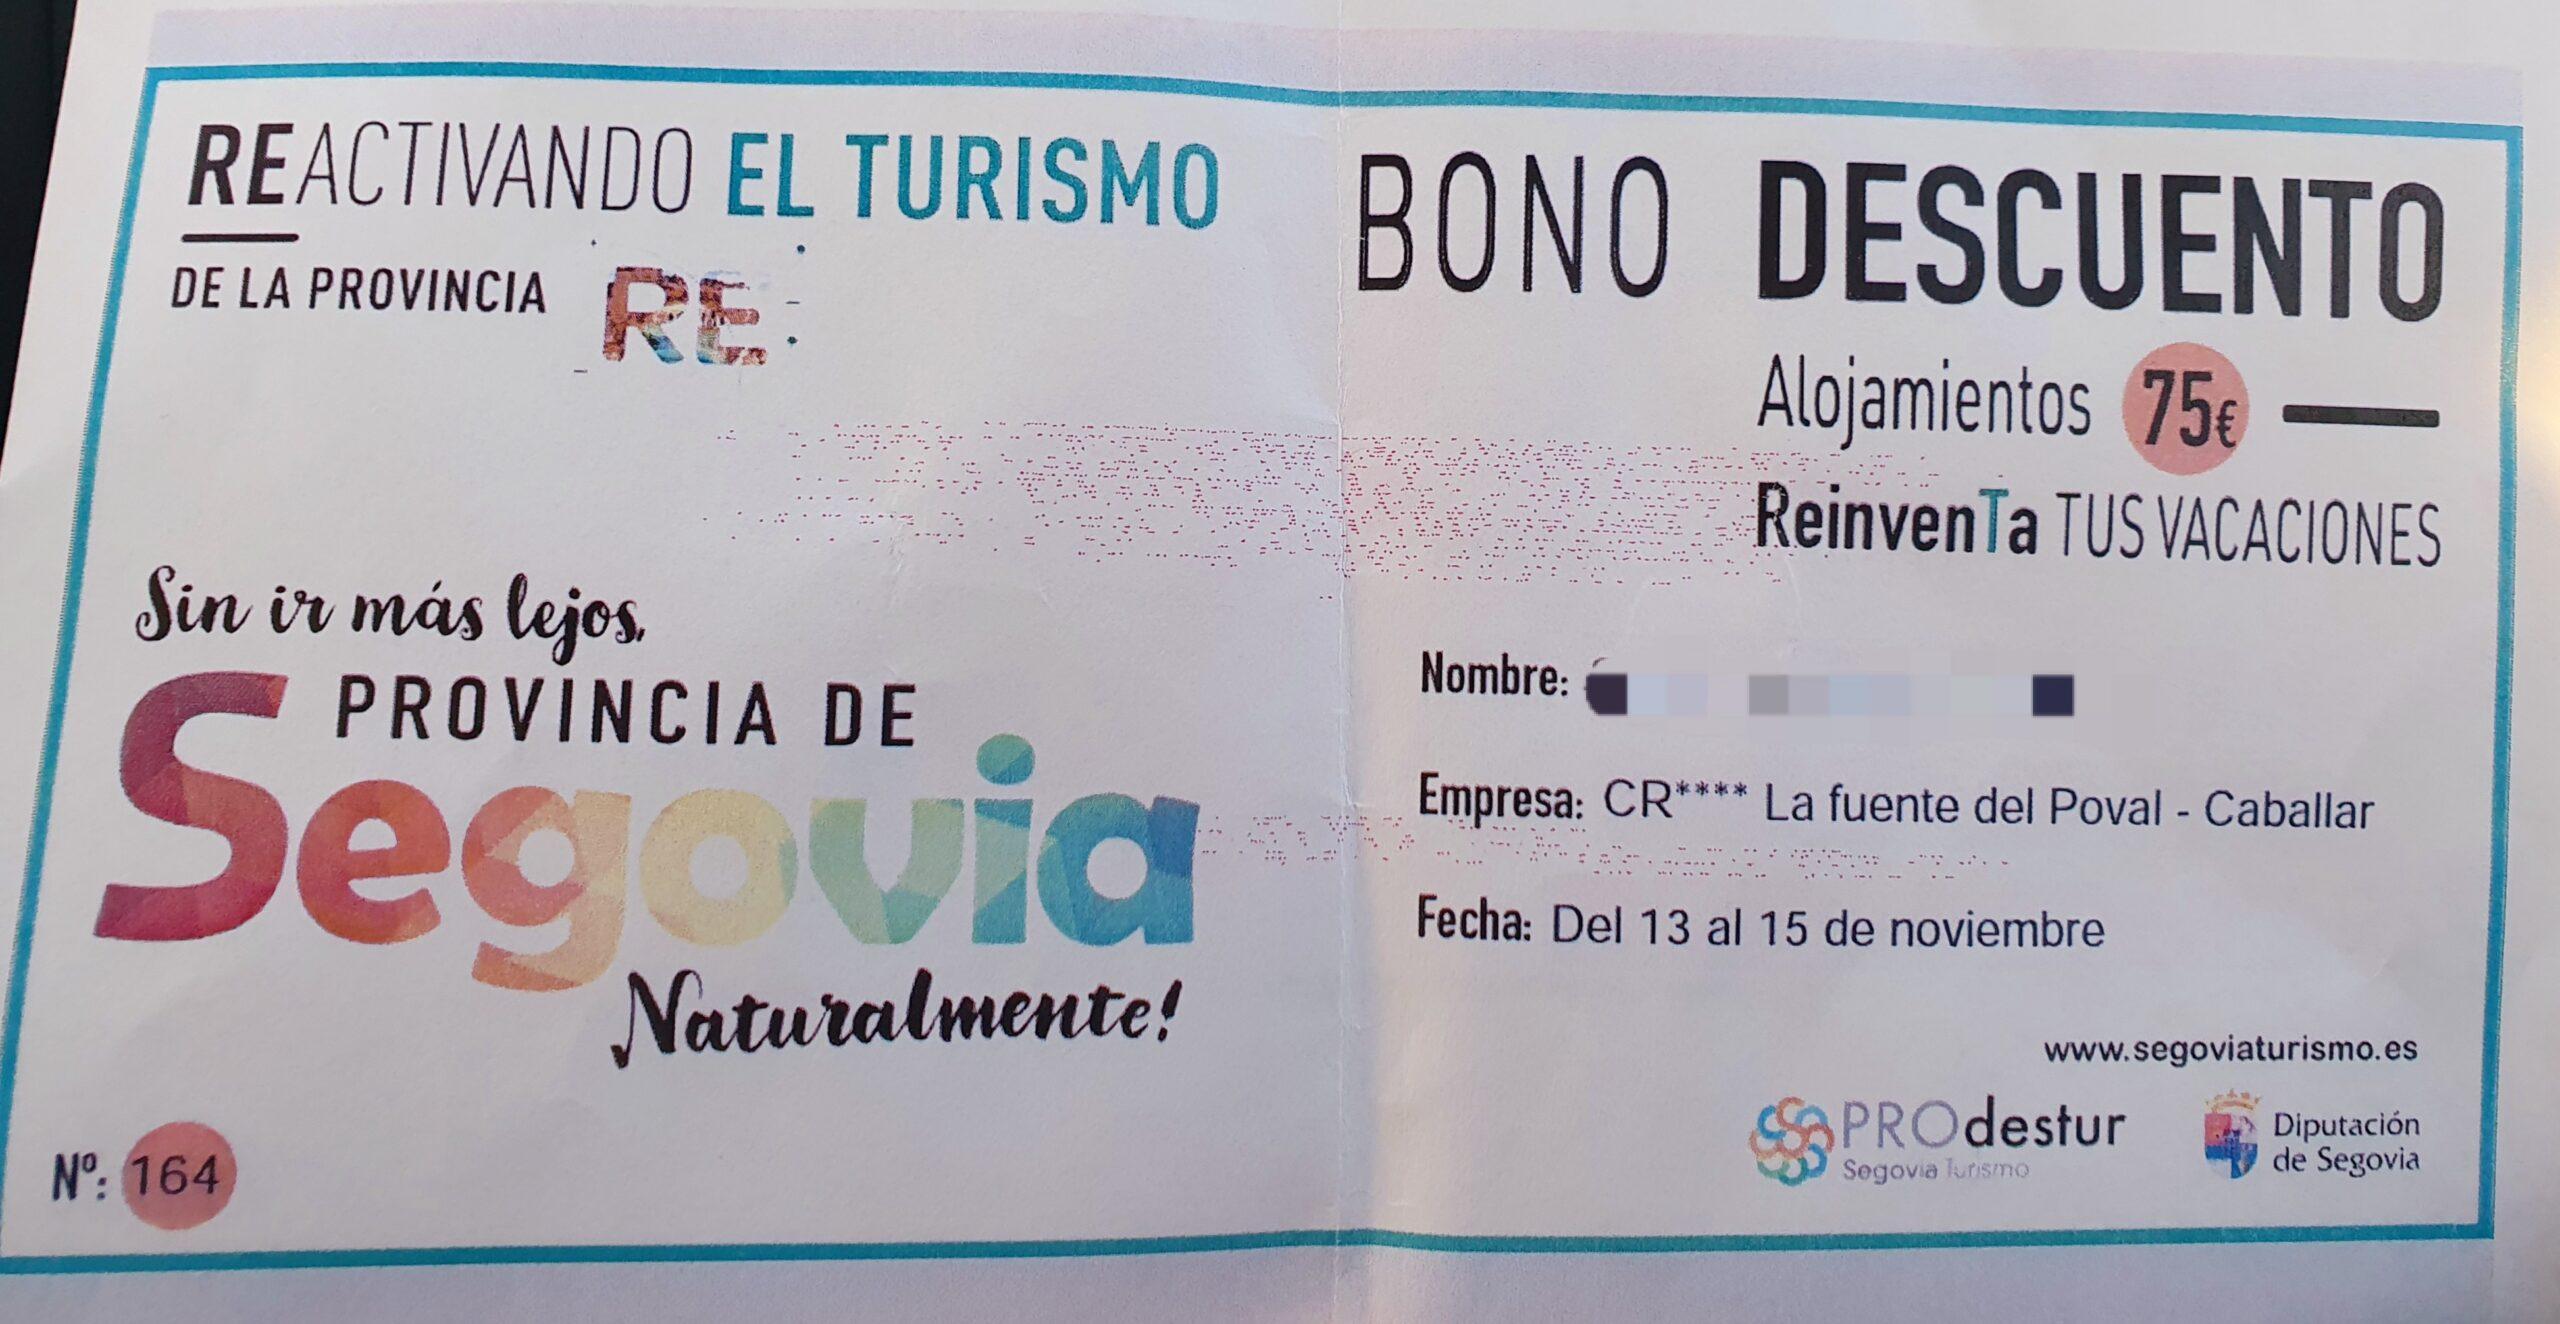 Bonos descuento Segovia